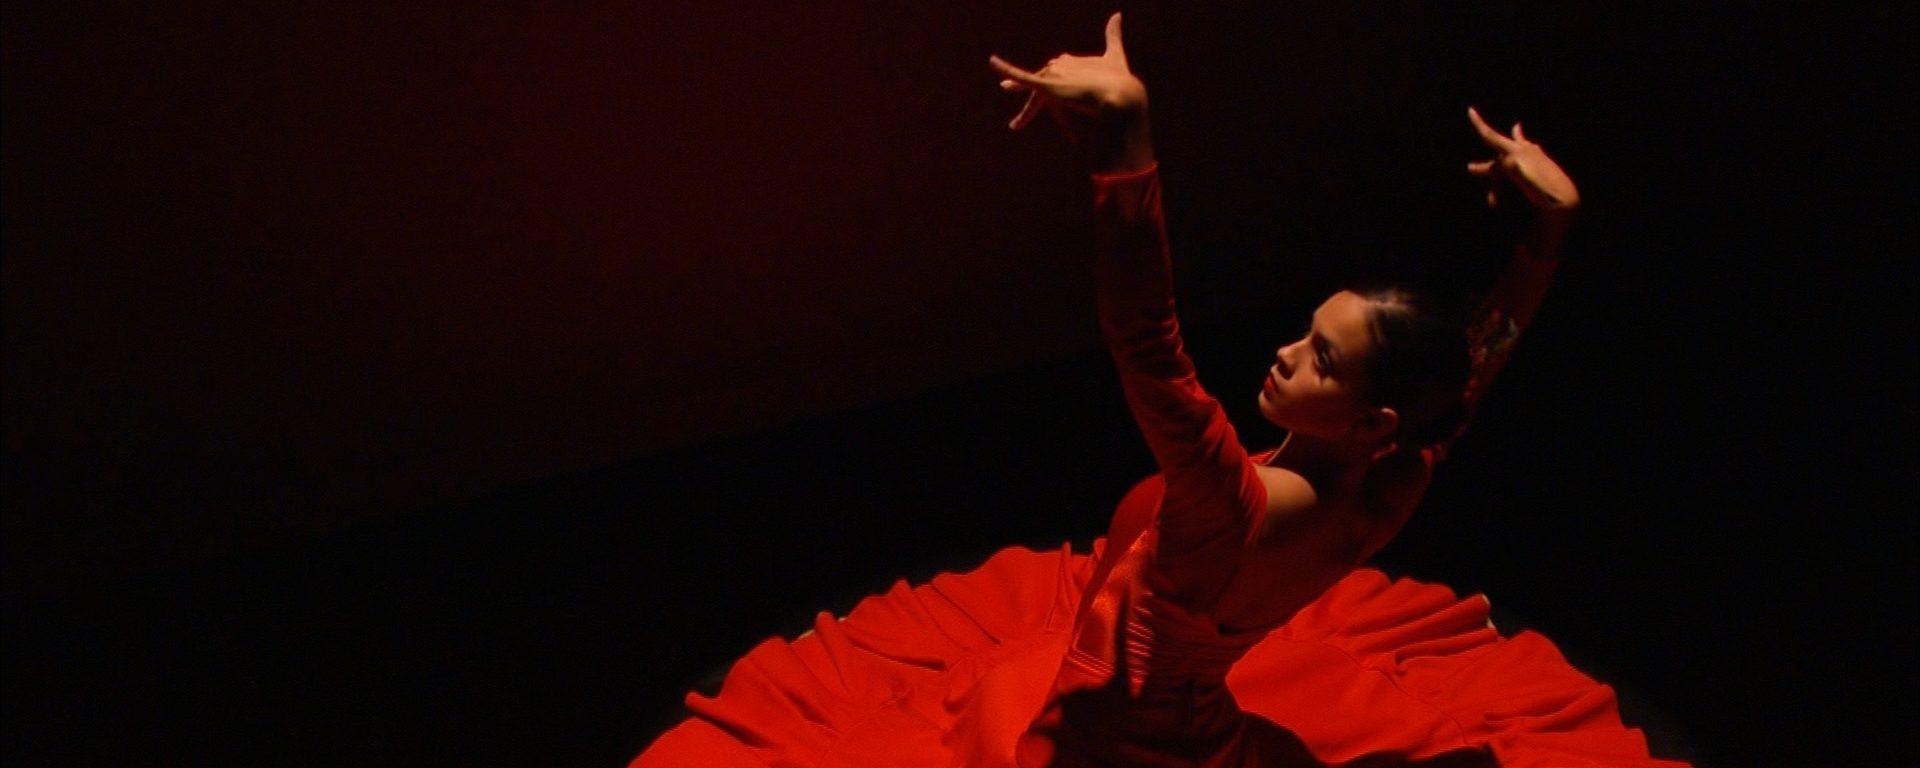 flamenco dance classes u2013 dainfern news